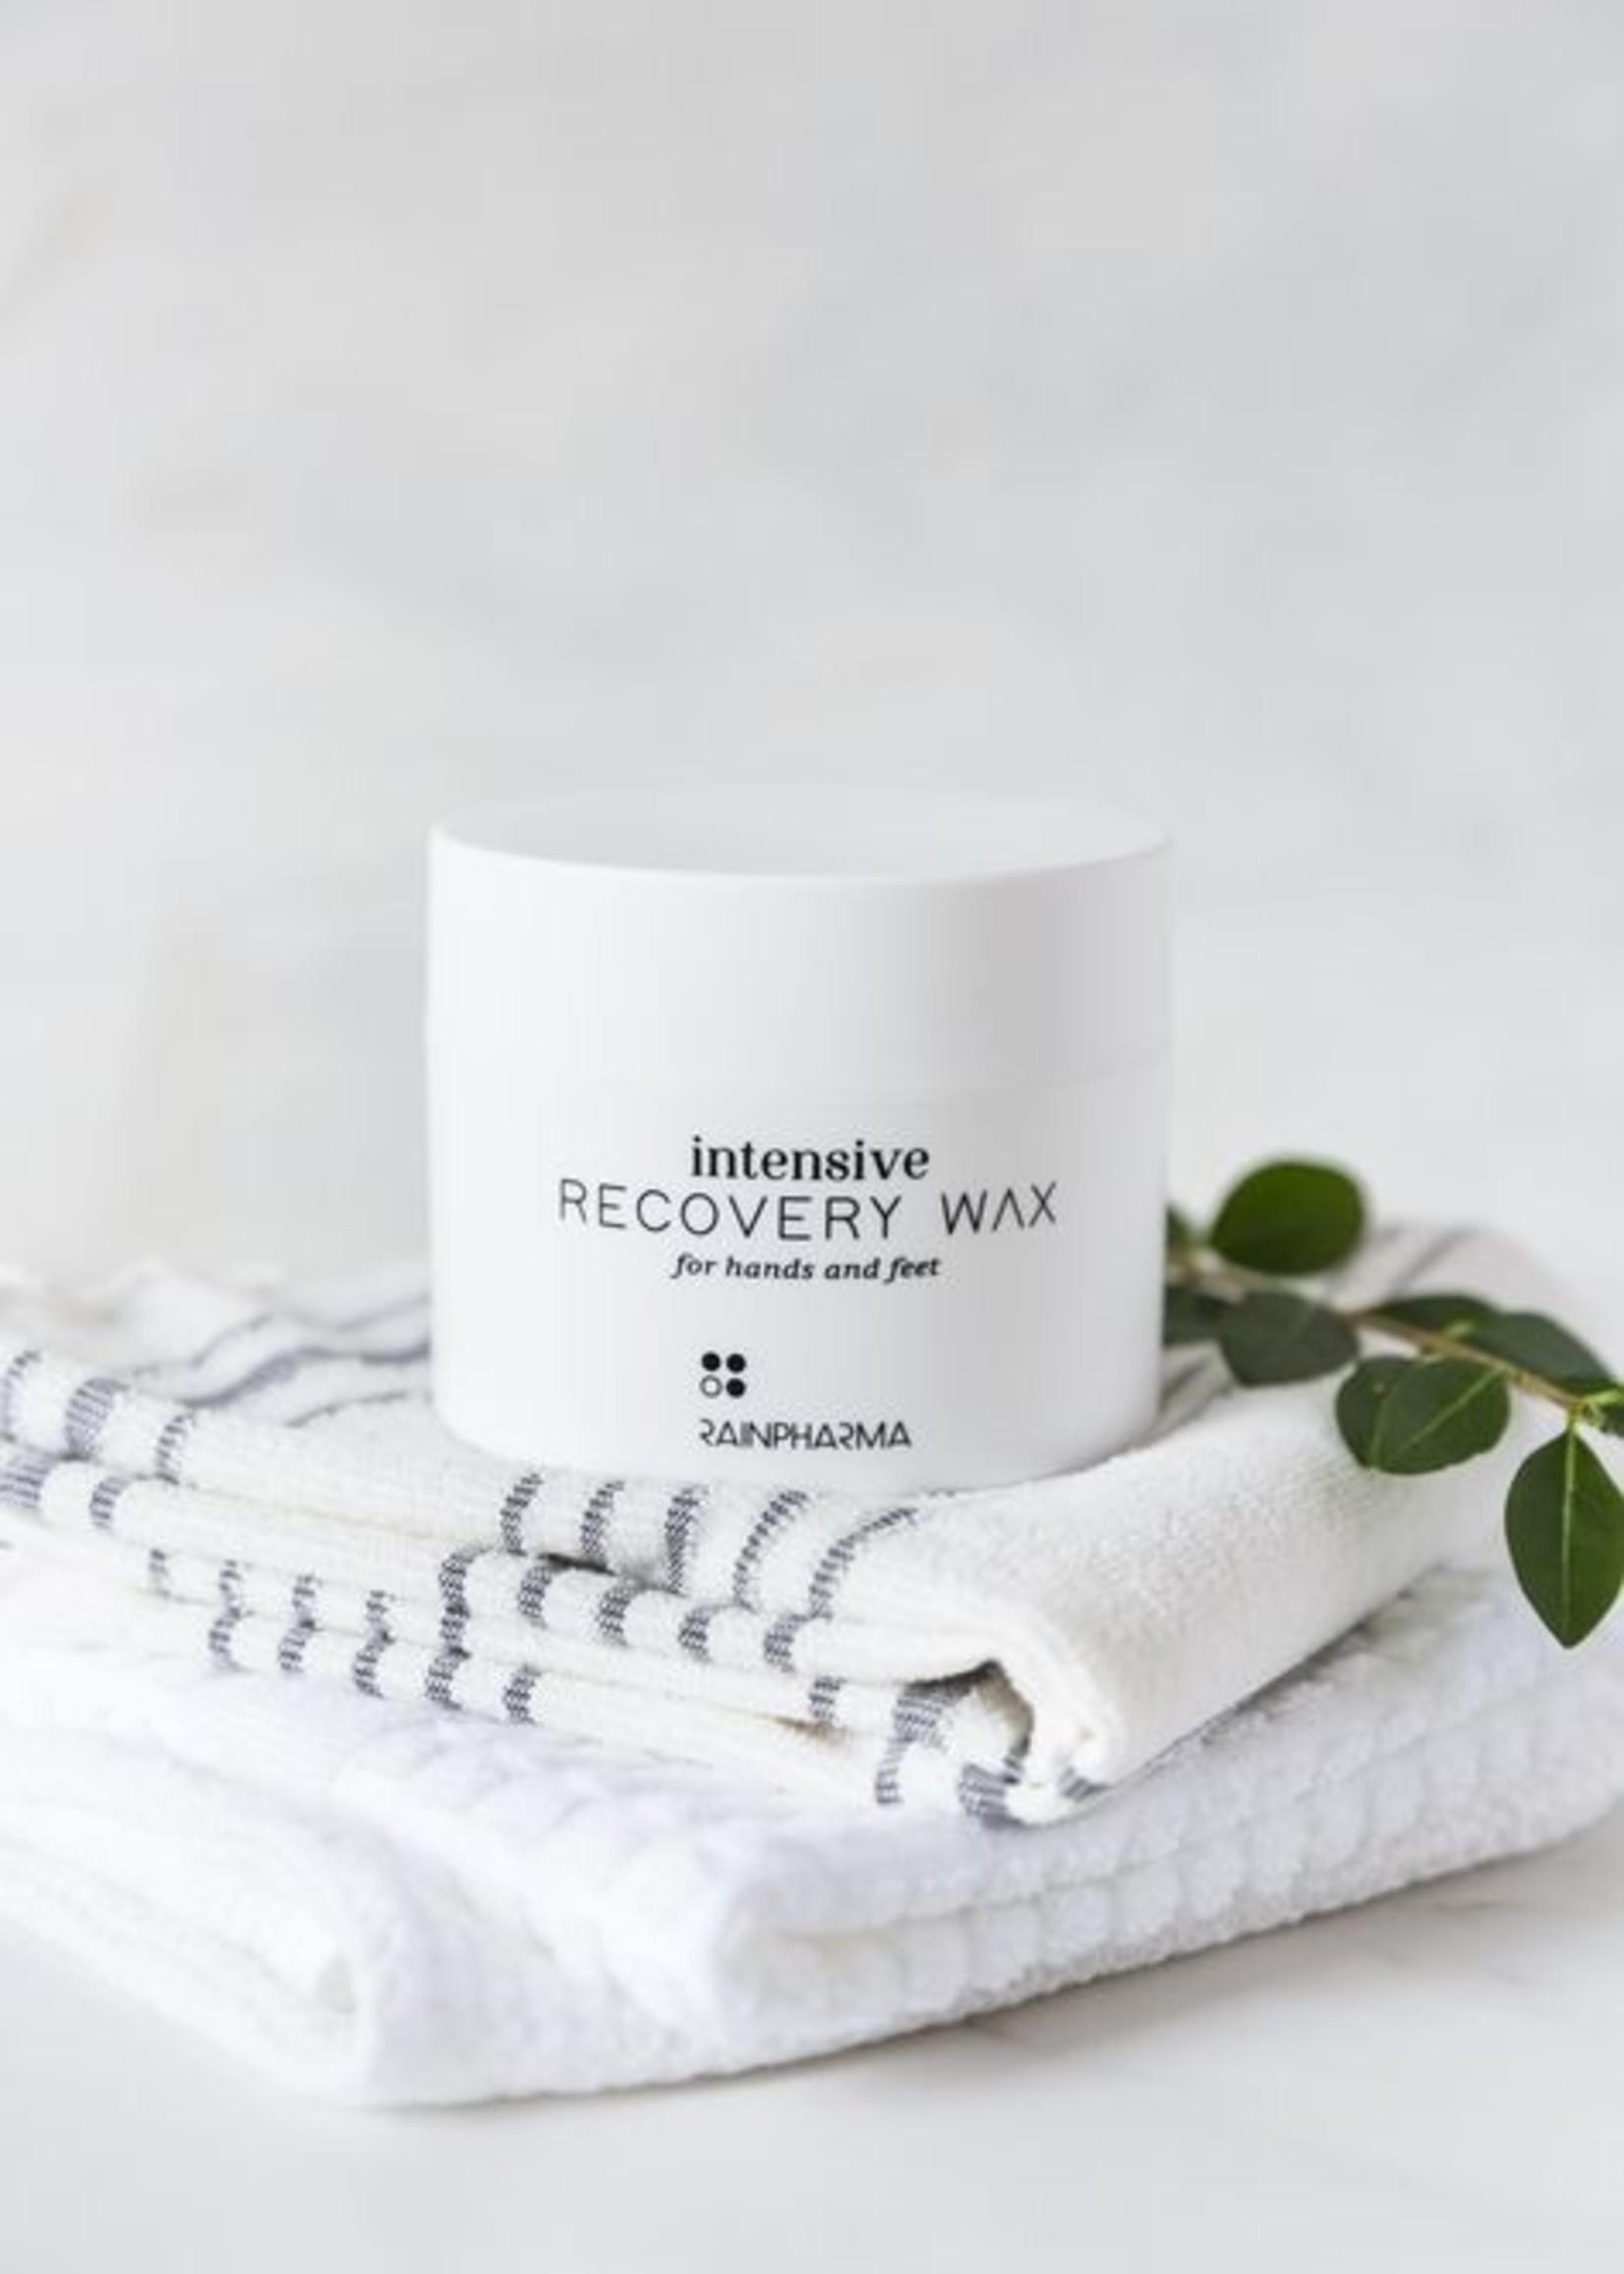 Rainpharma INTENSIVE RECOVERY WAX